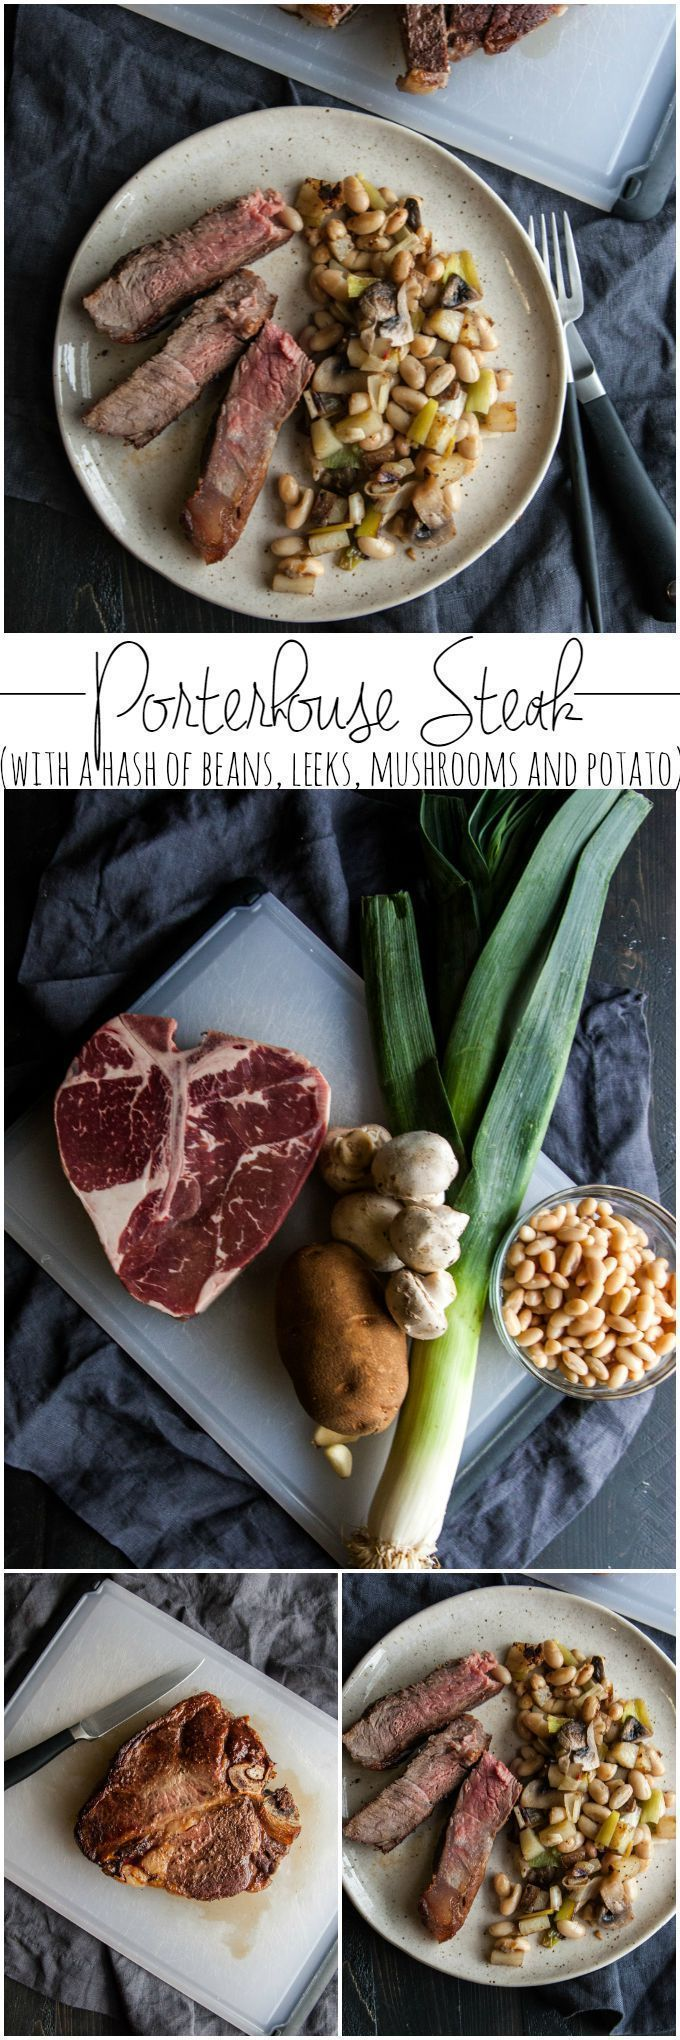 Porterhouse steak with a hash of beans leeks mushrooms and potato from @sweetphi, steak, gluten free dinner idea